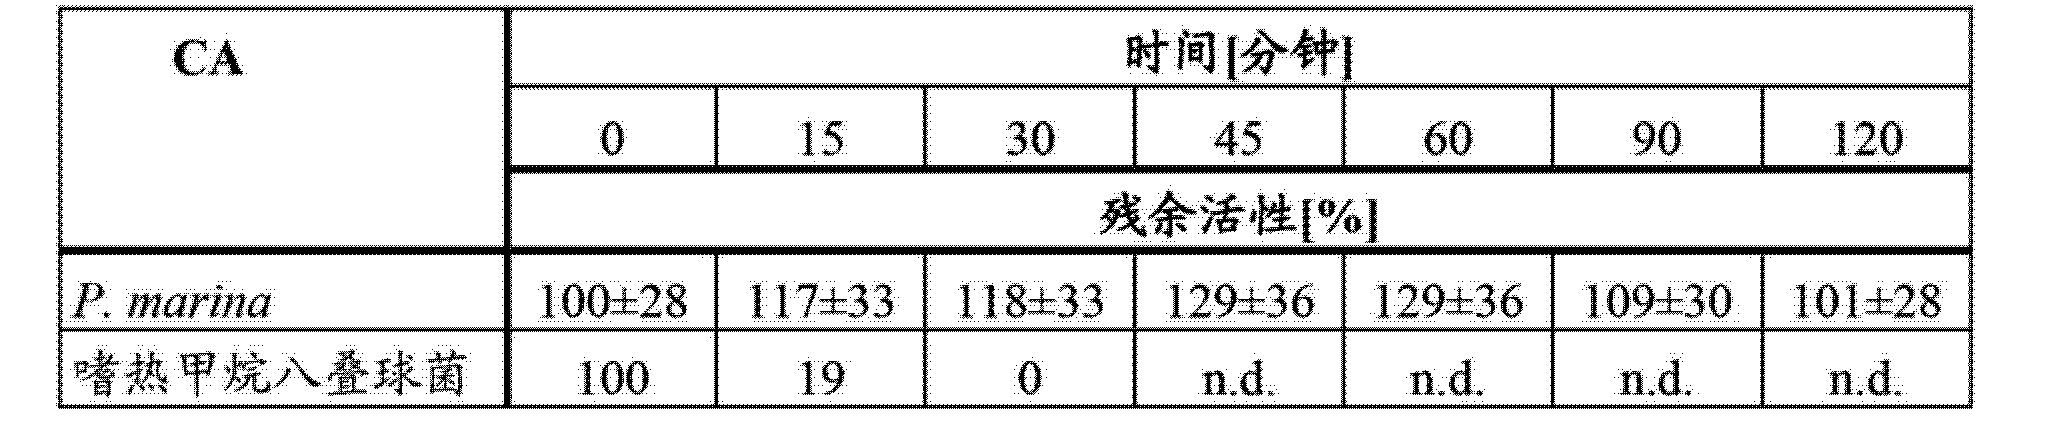 Figure CN103180438AD00352